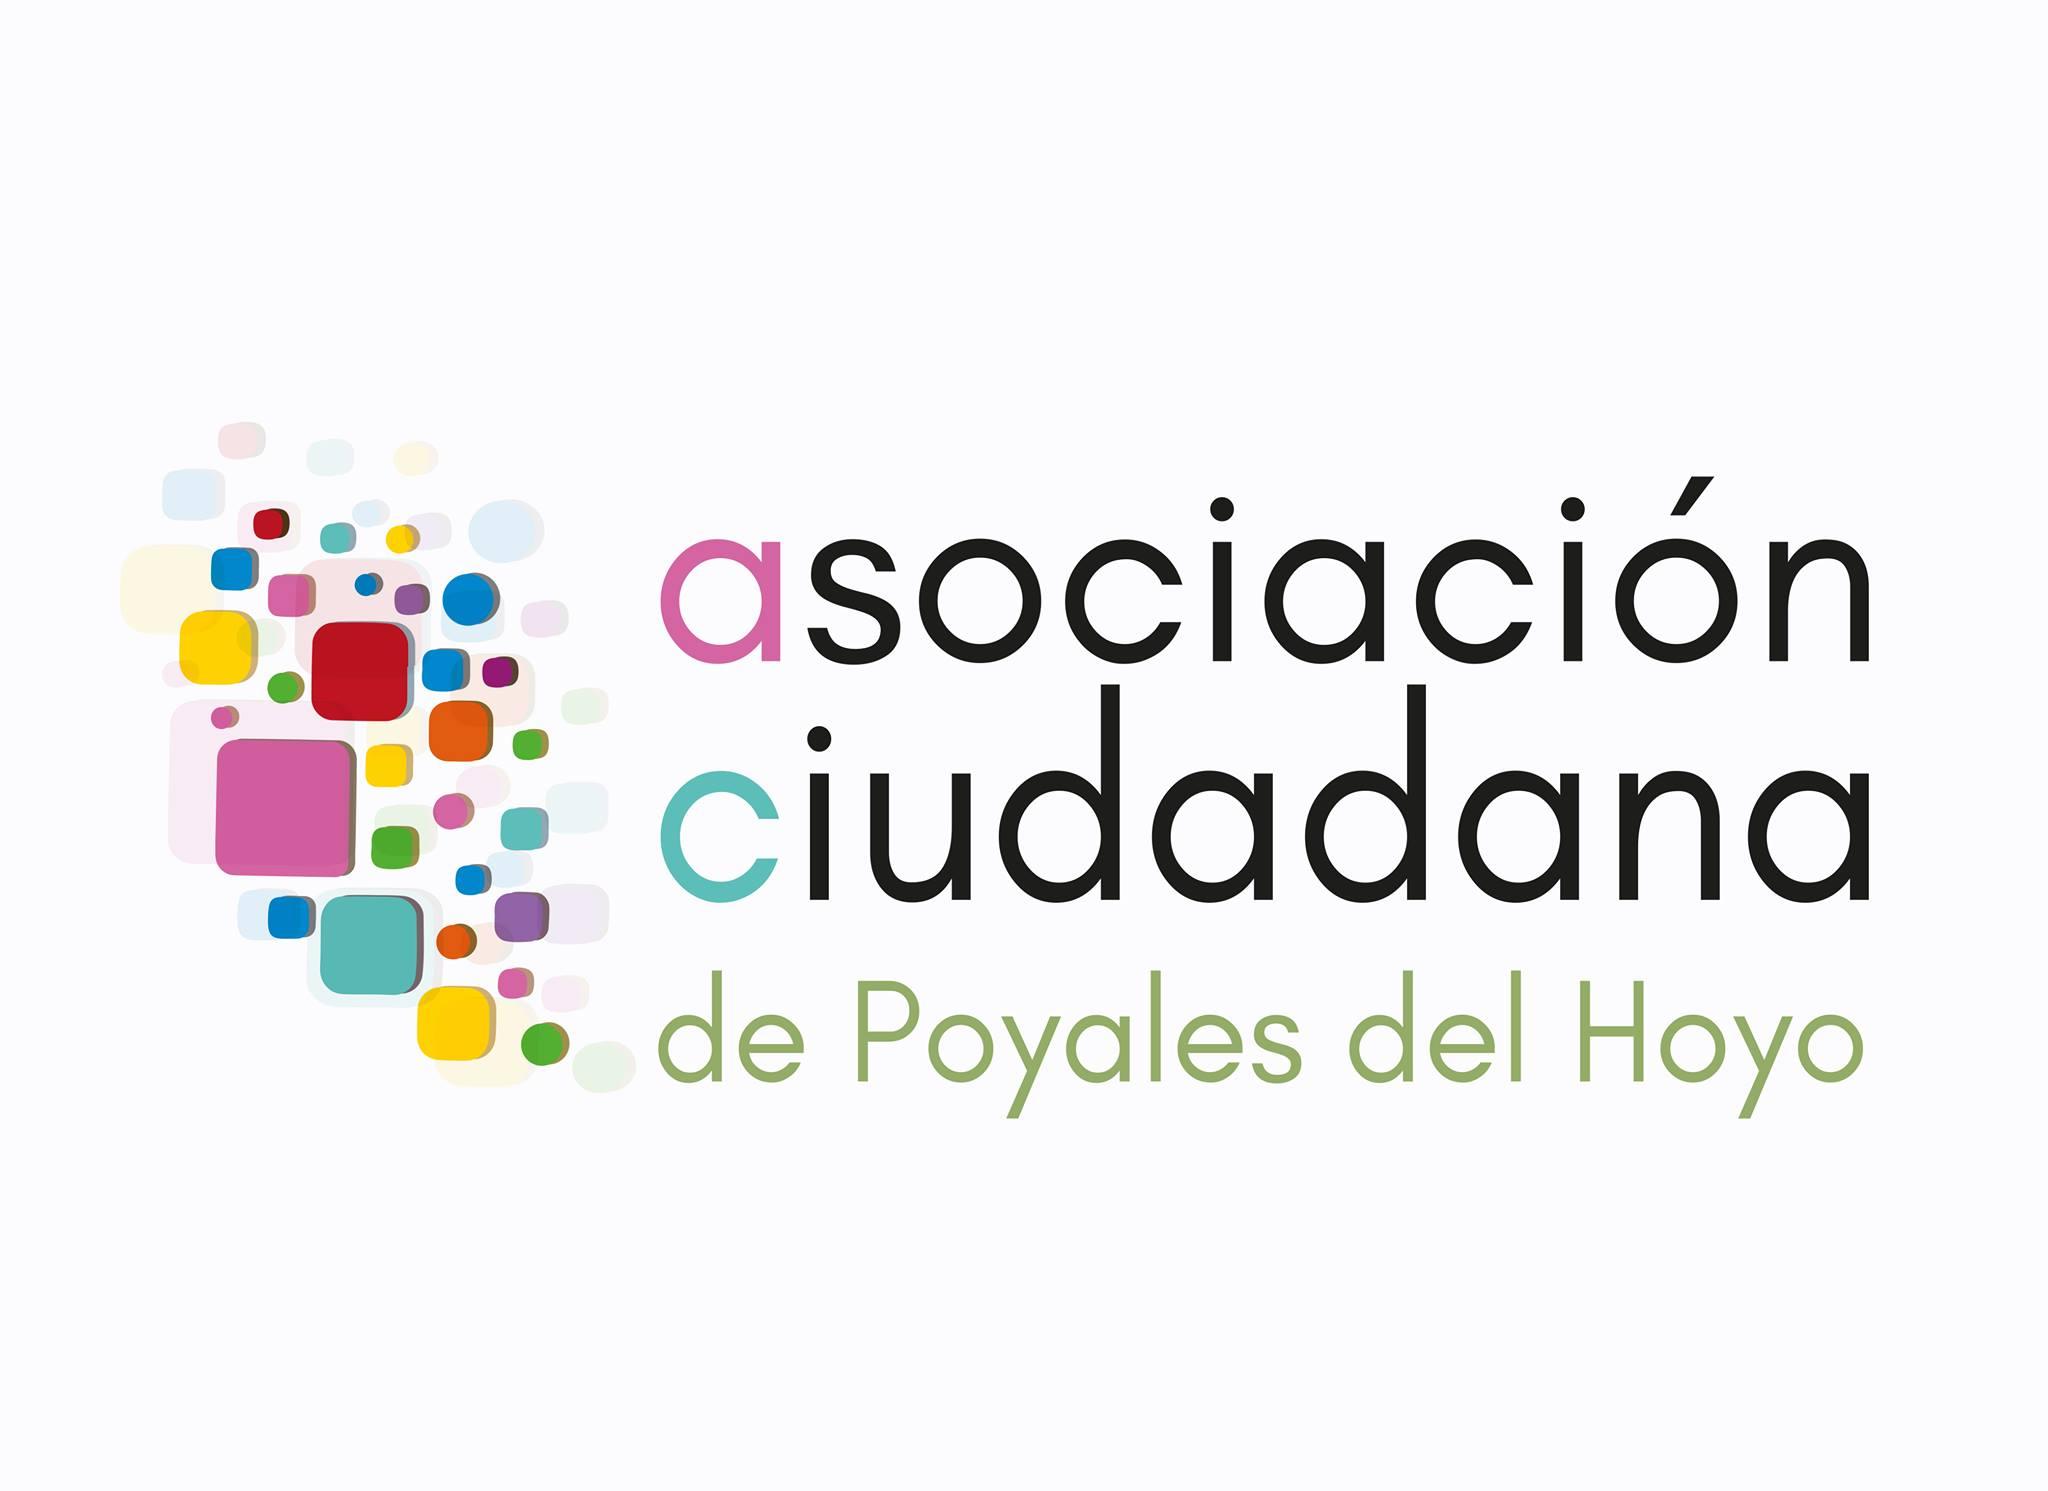 Logo Asociación Ciudadana de Poyales del Hoyo - TiétarTeVe